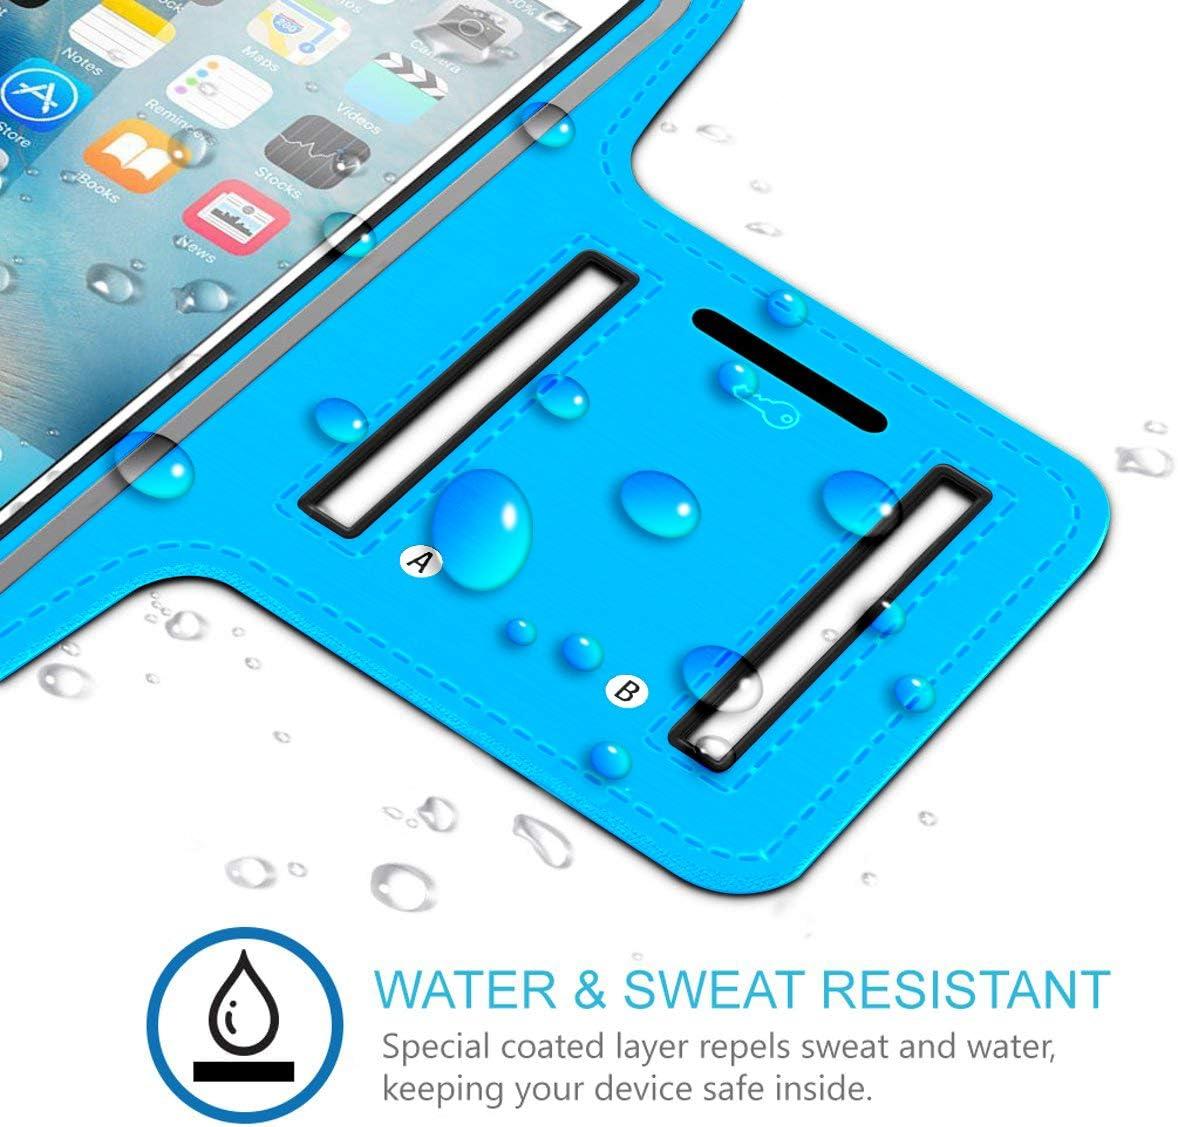 Amarillo Brazalete Deportivo Compatible con iPhone 11 Pro MAX de Neopreno Antideslizante antisudor con Bolsillo para Llaves Cable Tarjetas